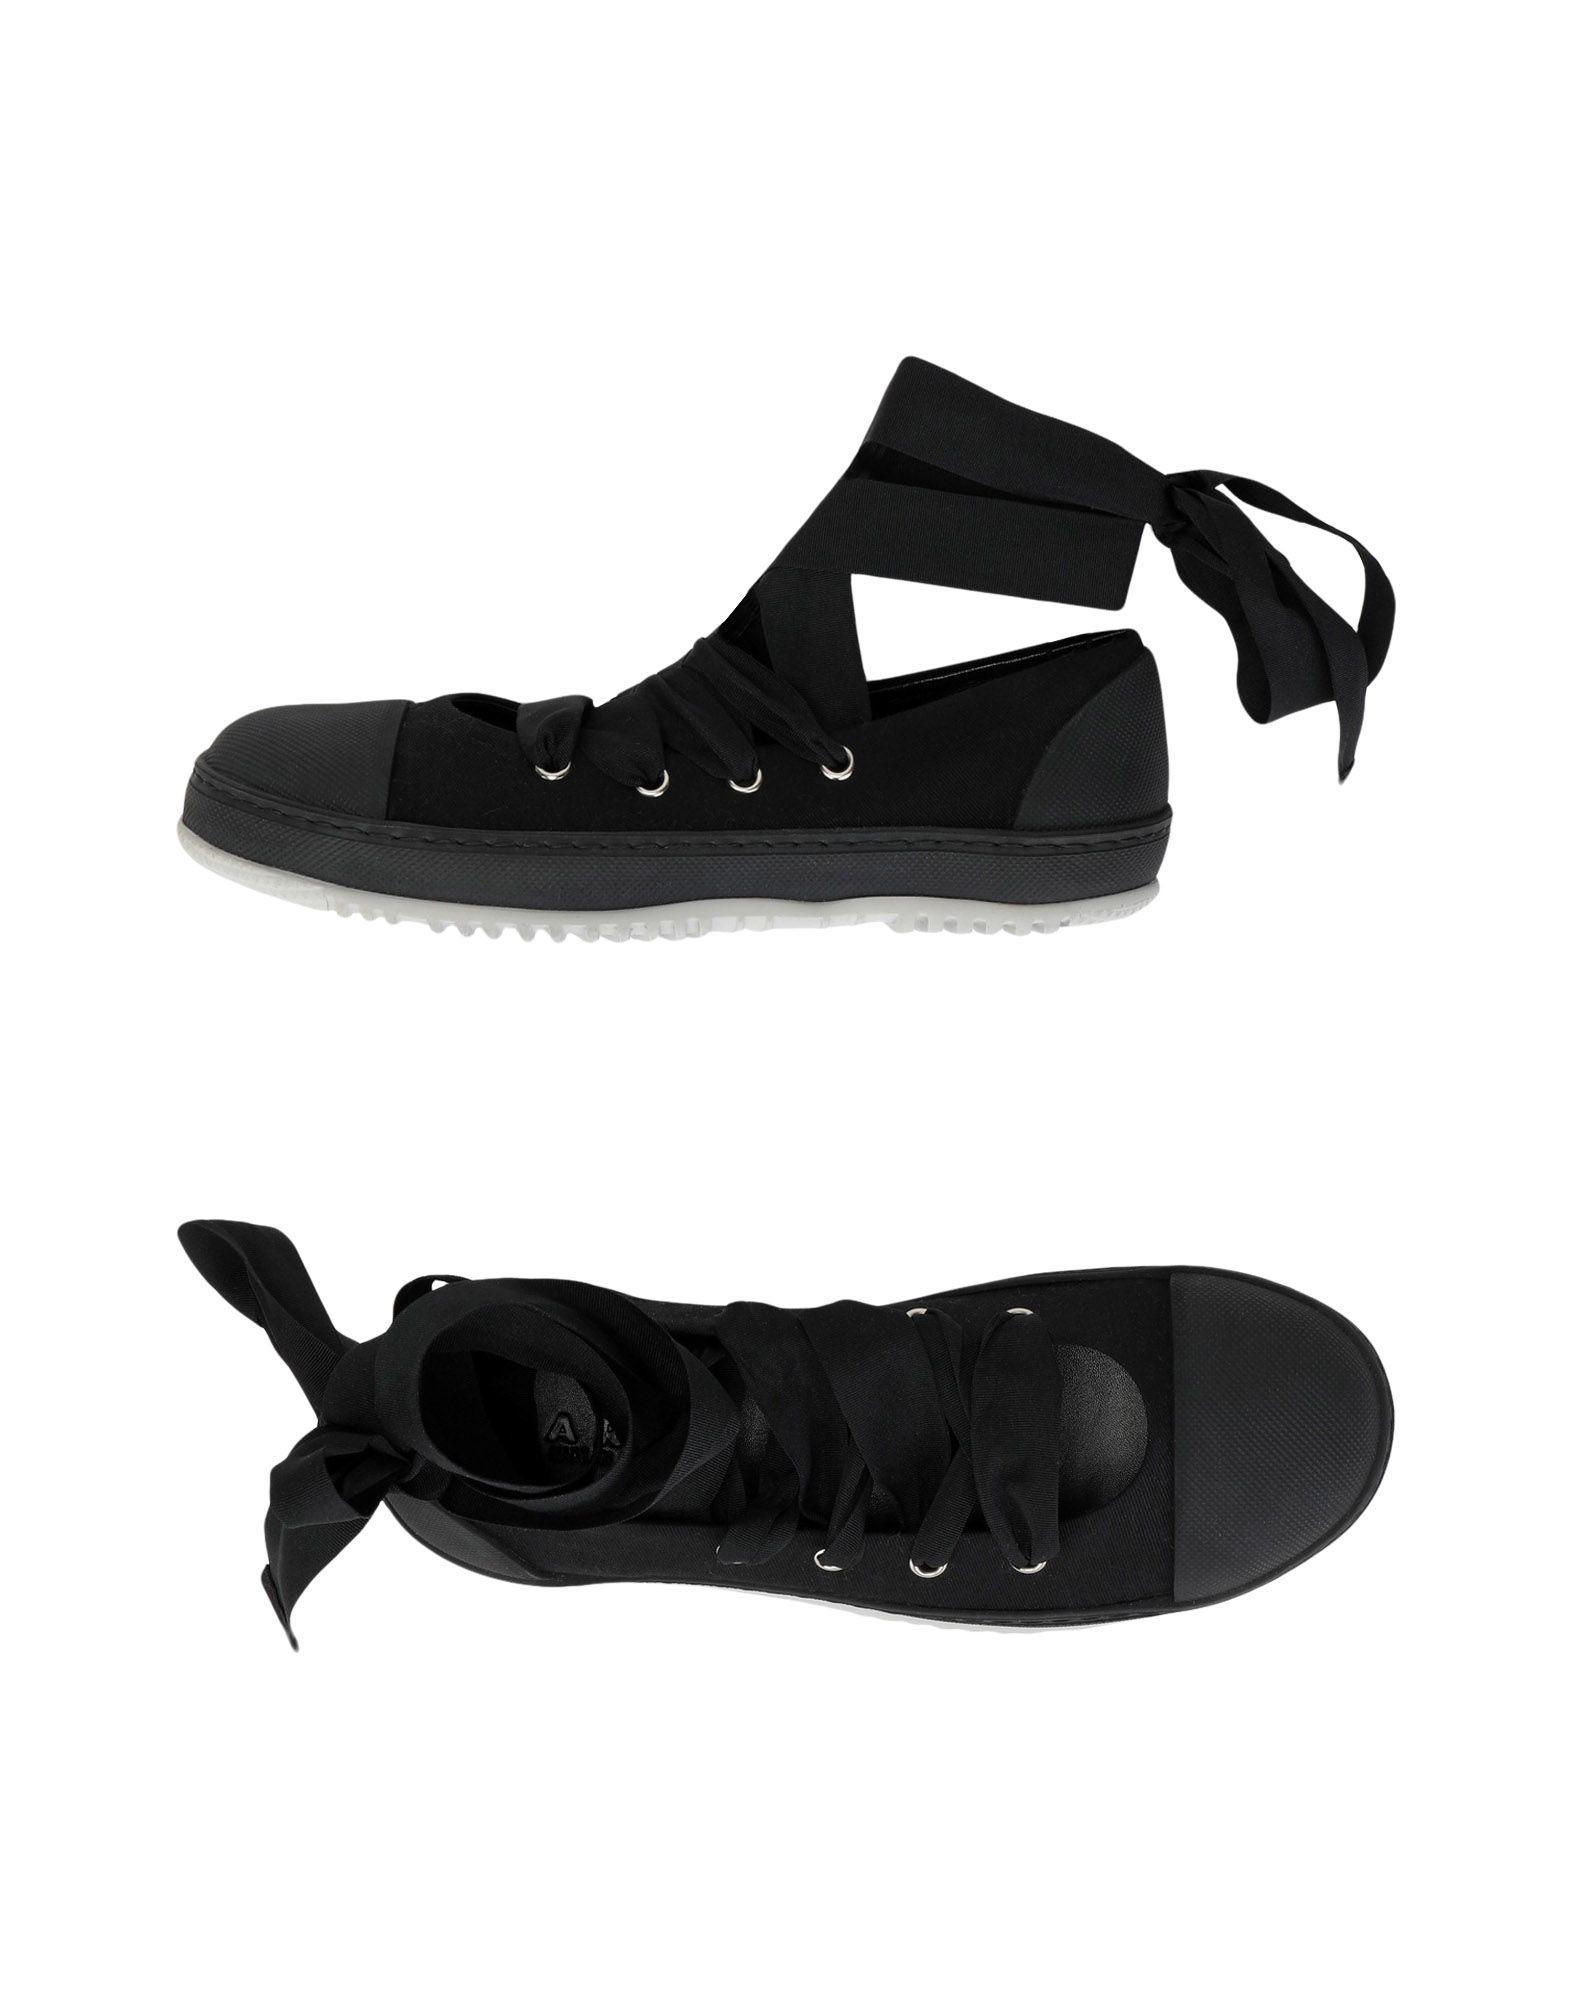 Sneakers Marni Femme - Sneakers Marni sur